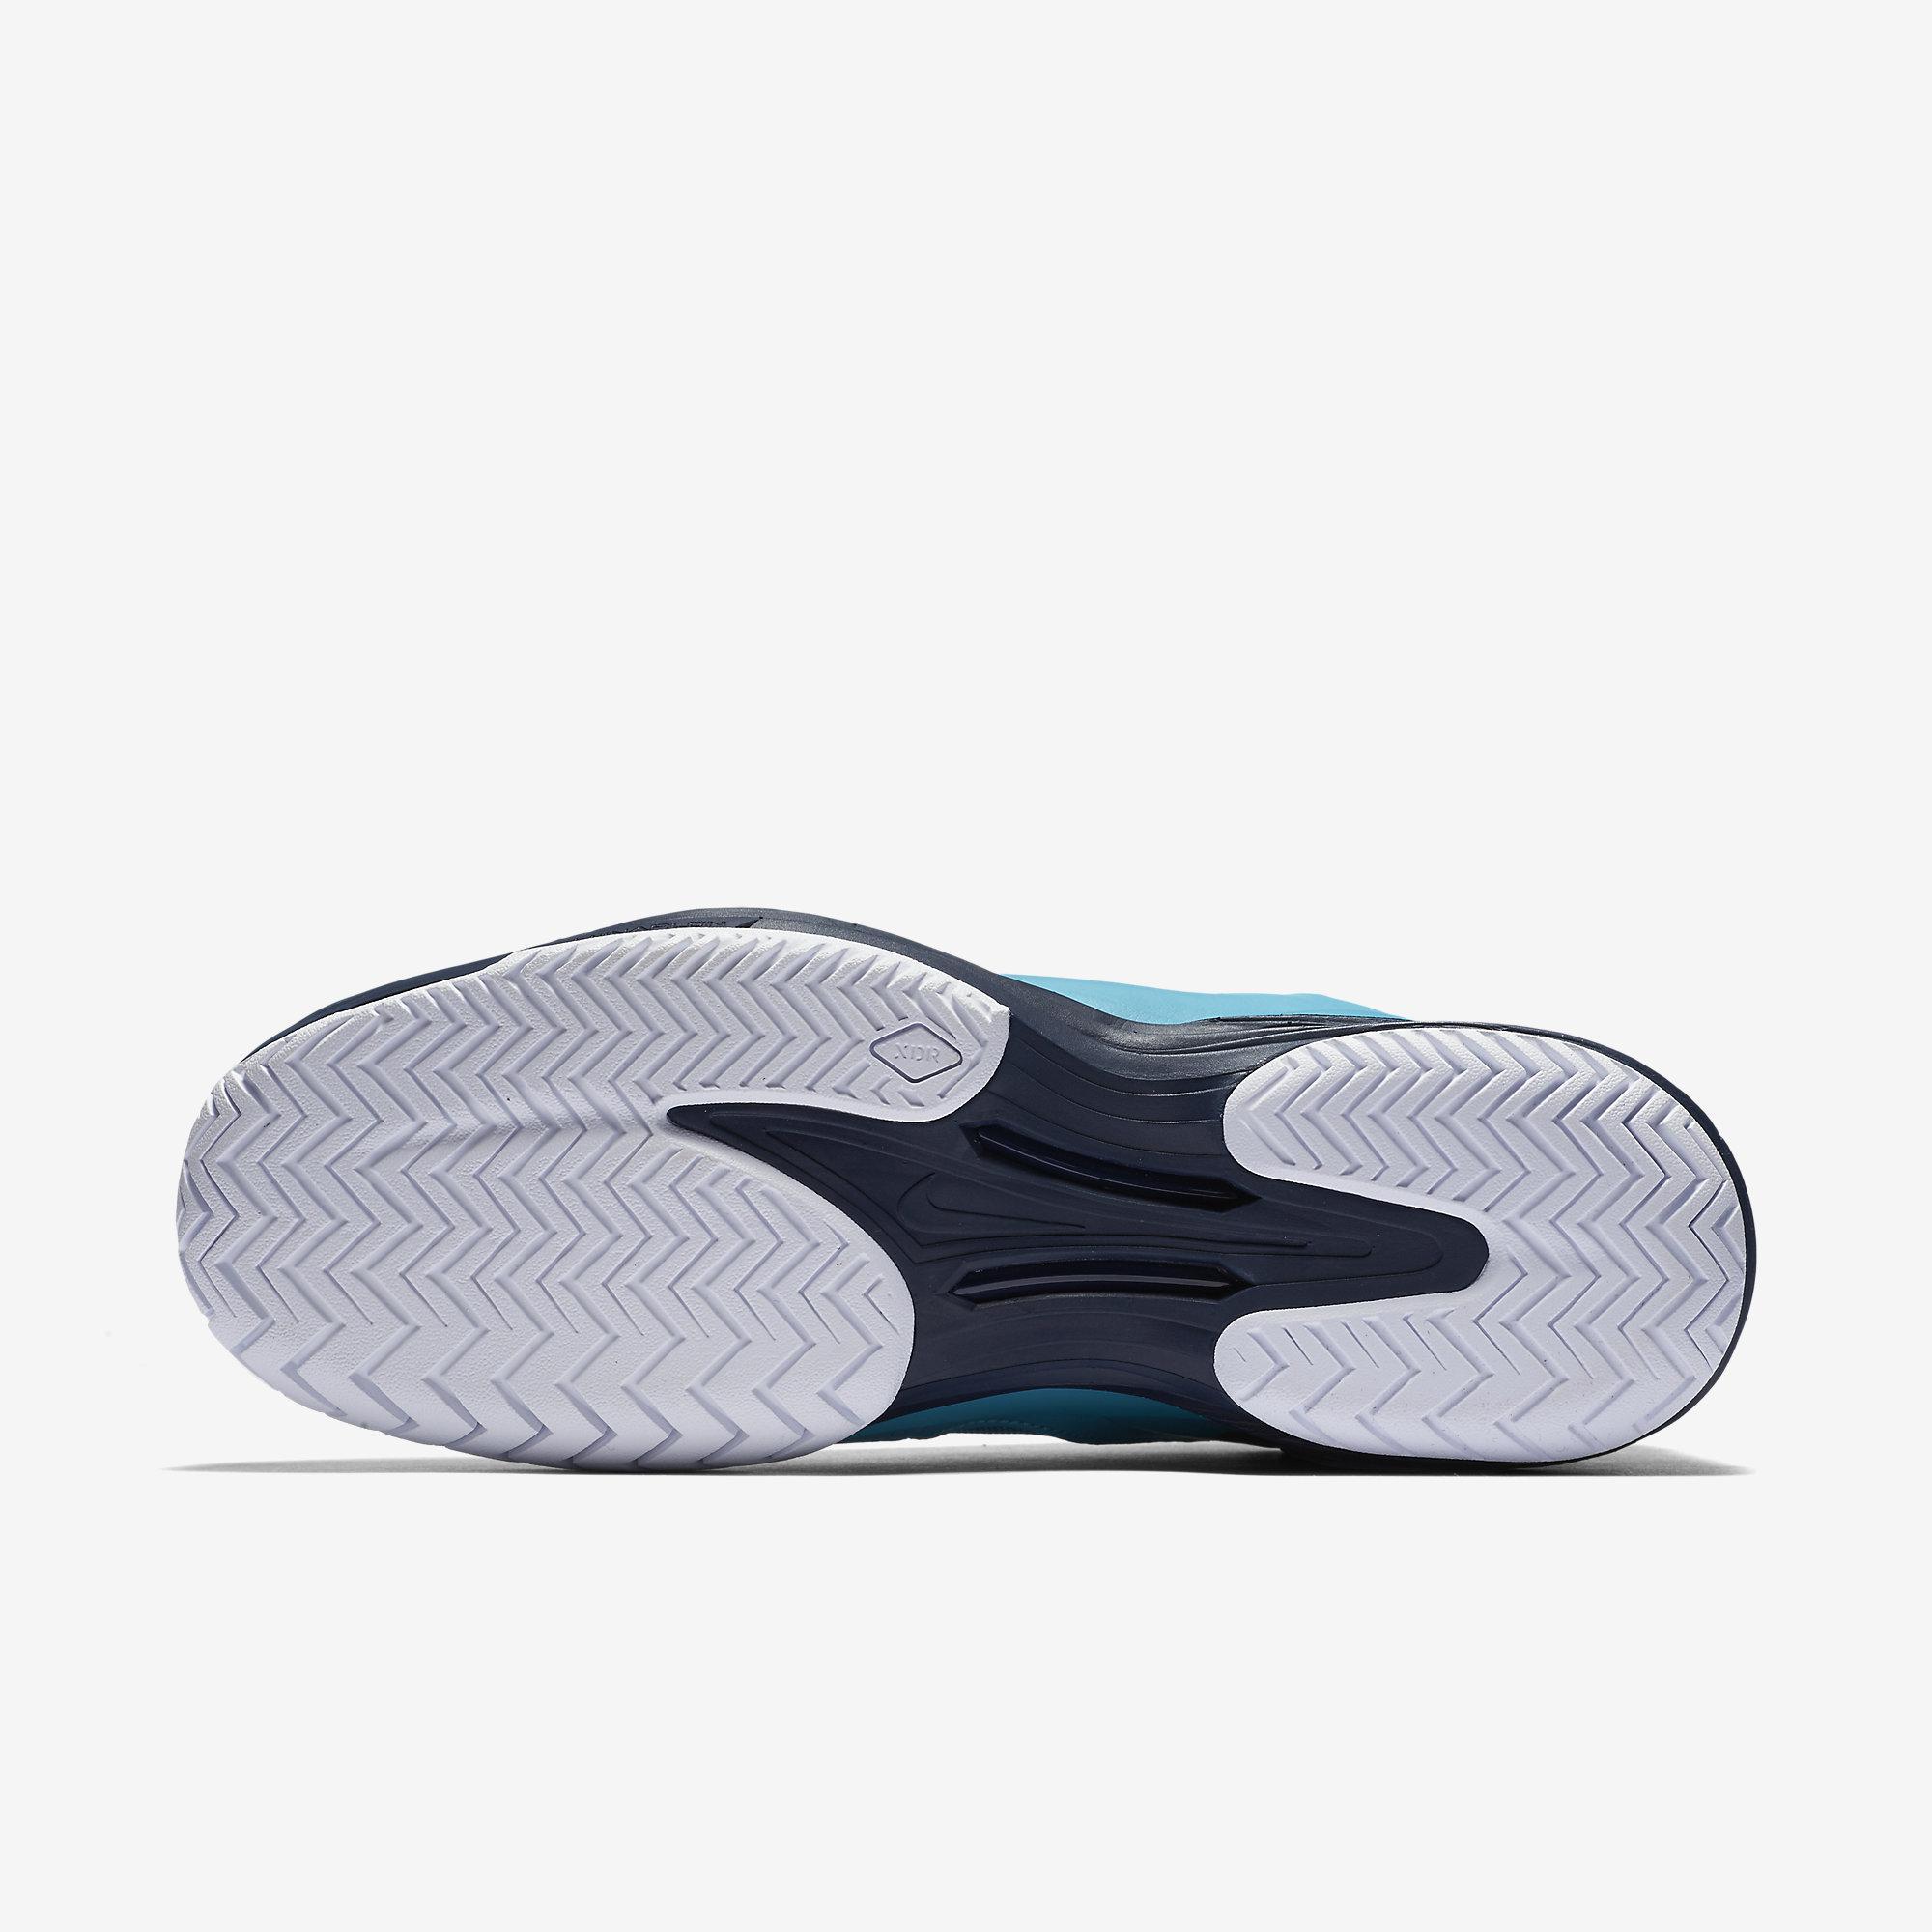 Nike Lunar Ballistec   Lg Mens Tennis Shoes